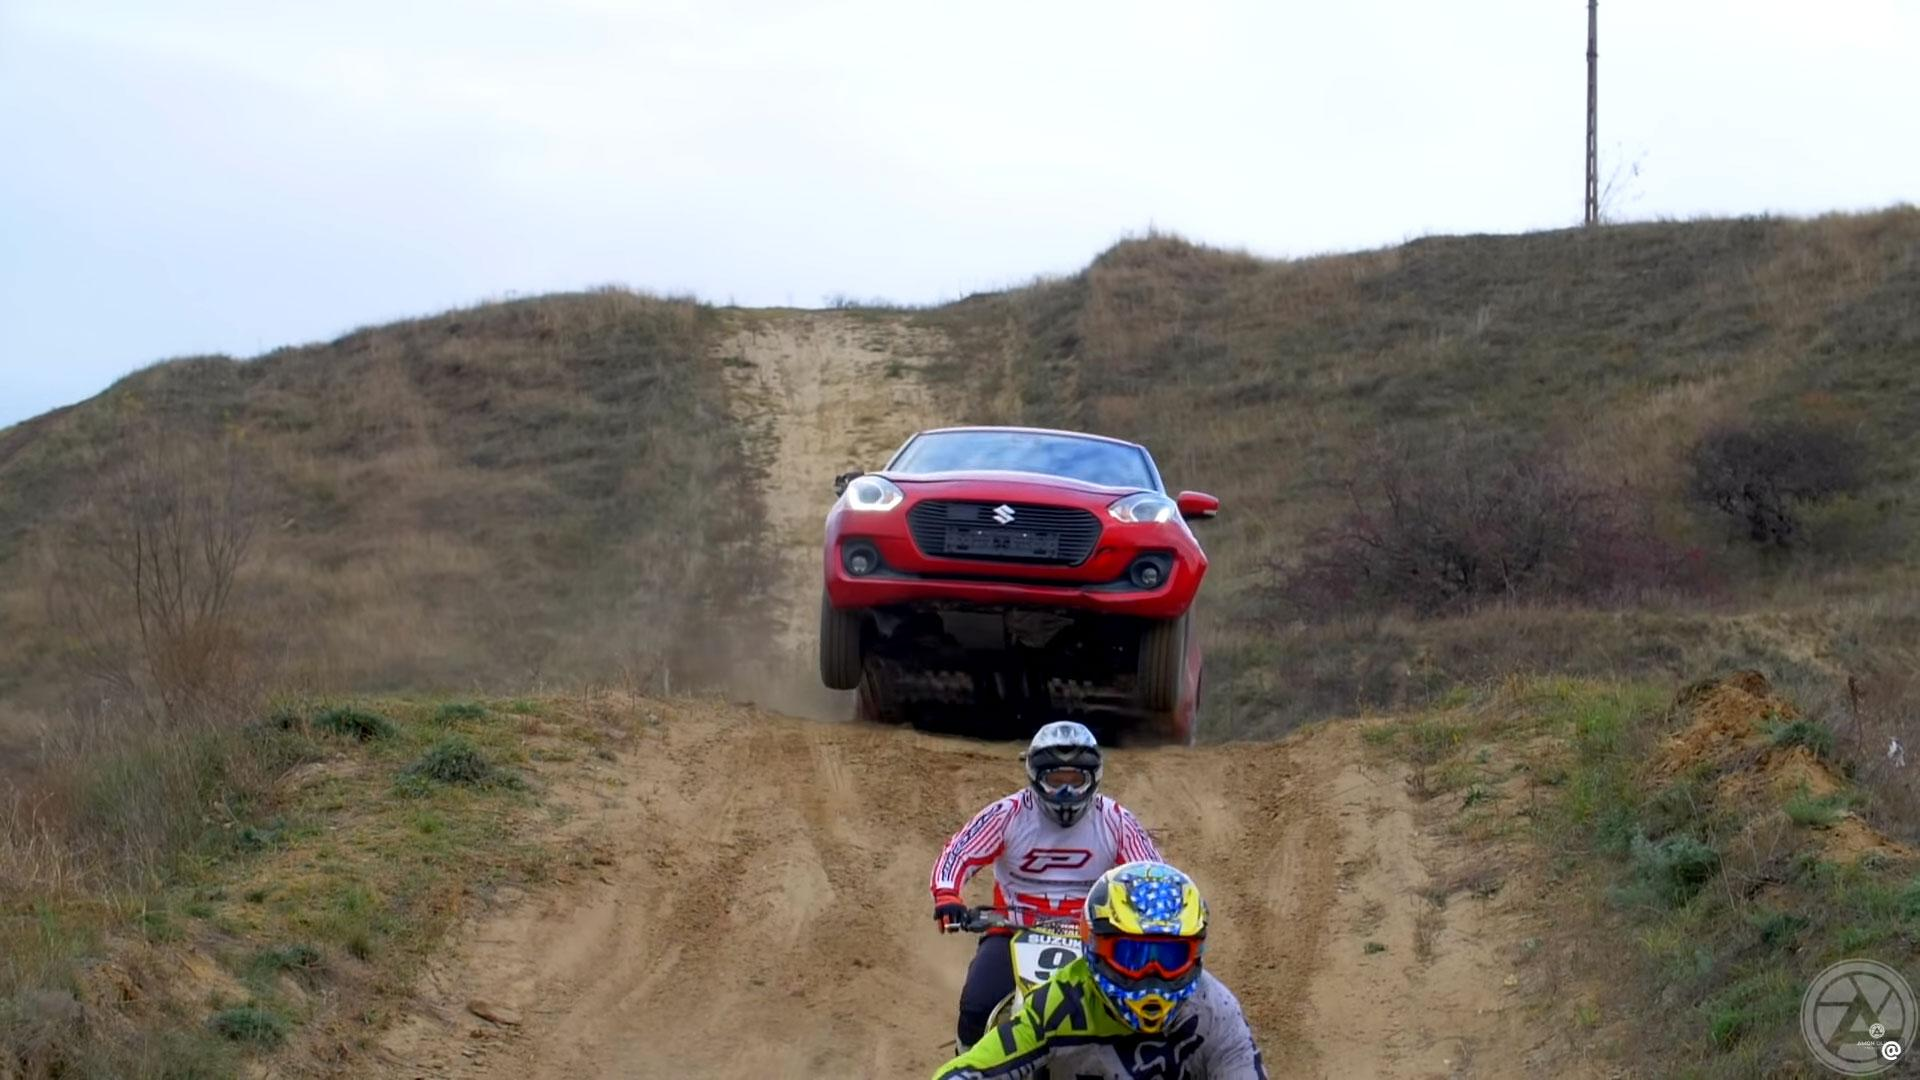 Meest afgetrapte Suzuki Swift ter wereld sprong